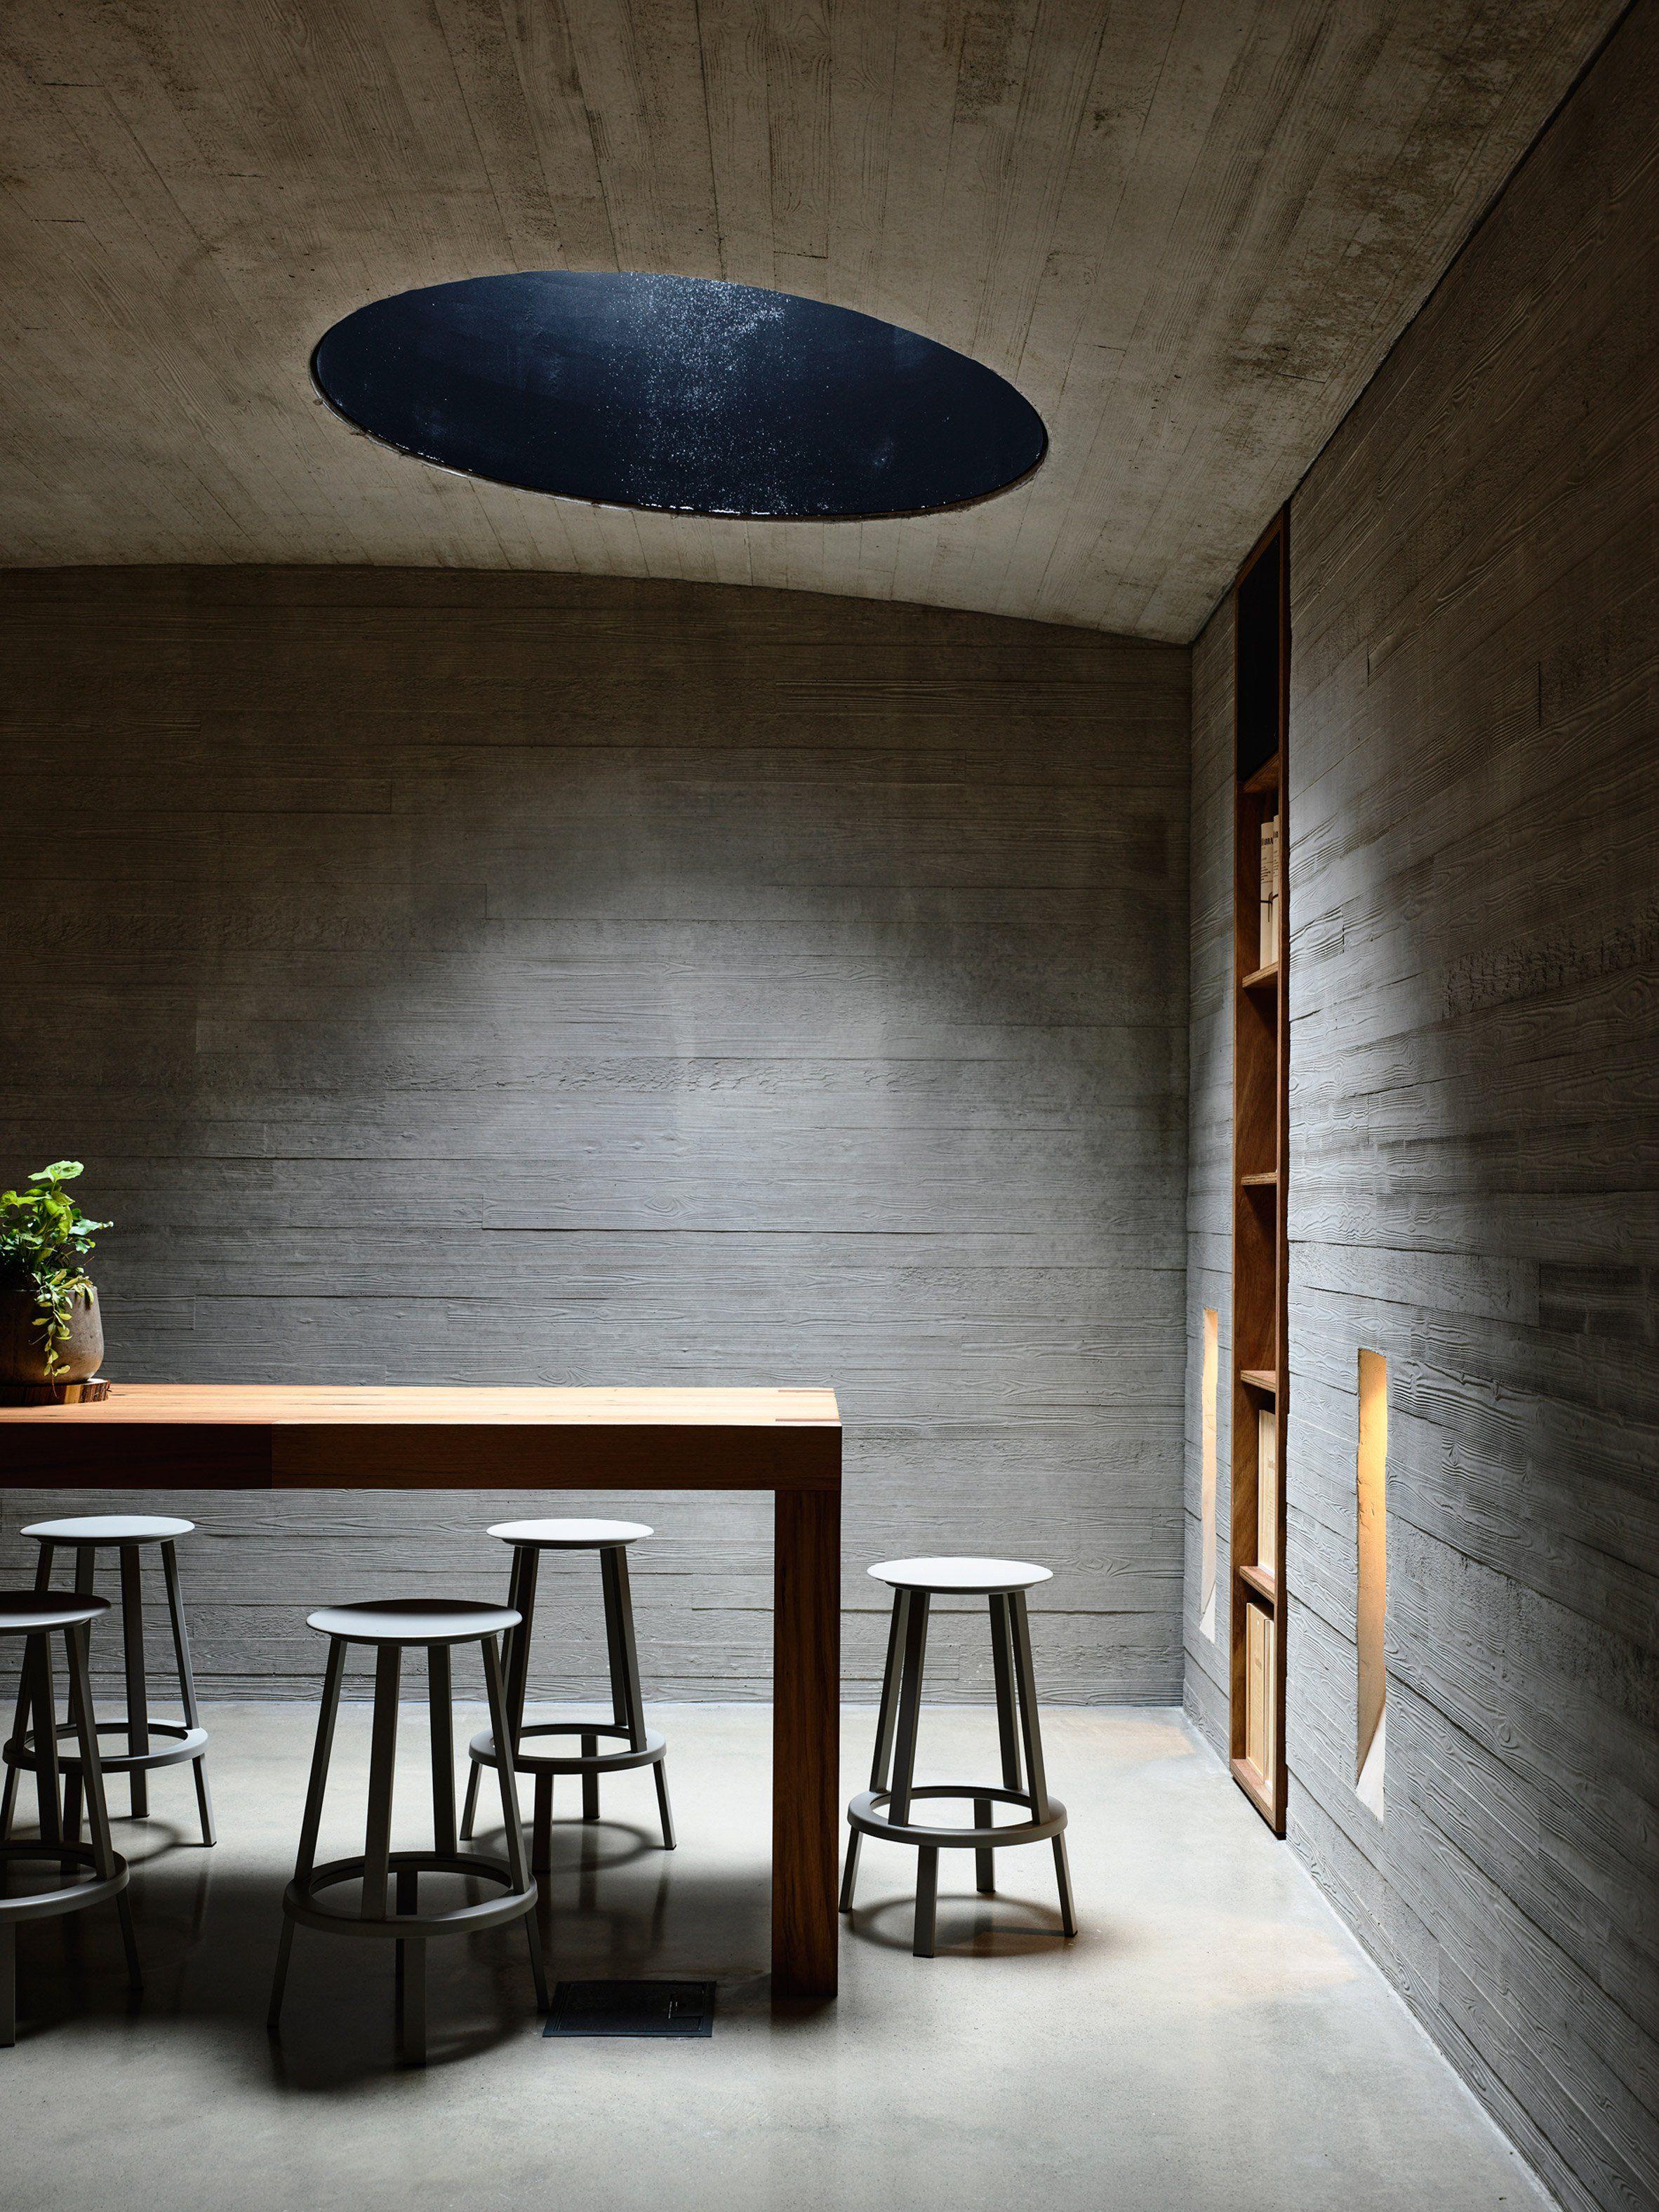 Kerstin thompson adds underground tasting room to australian winery